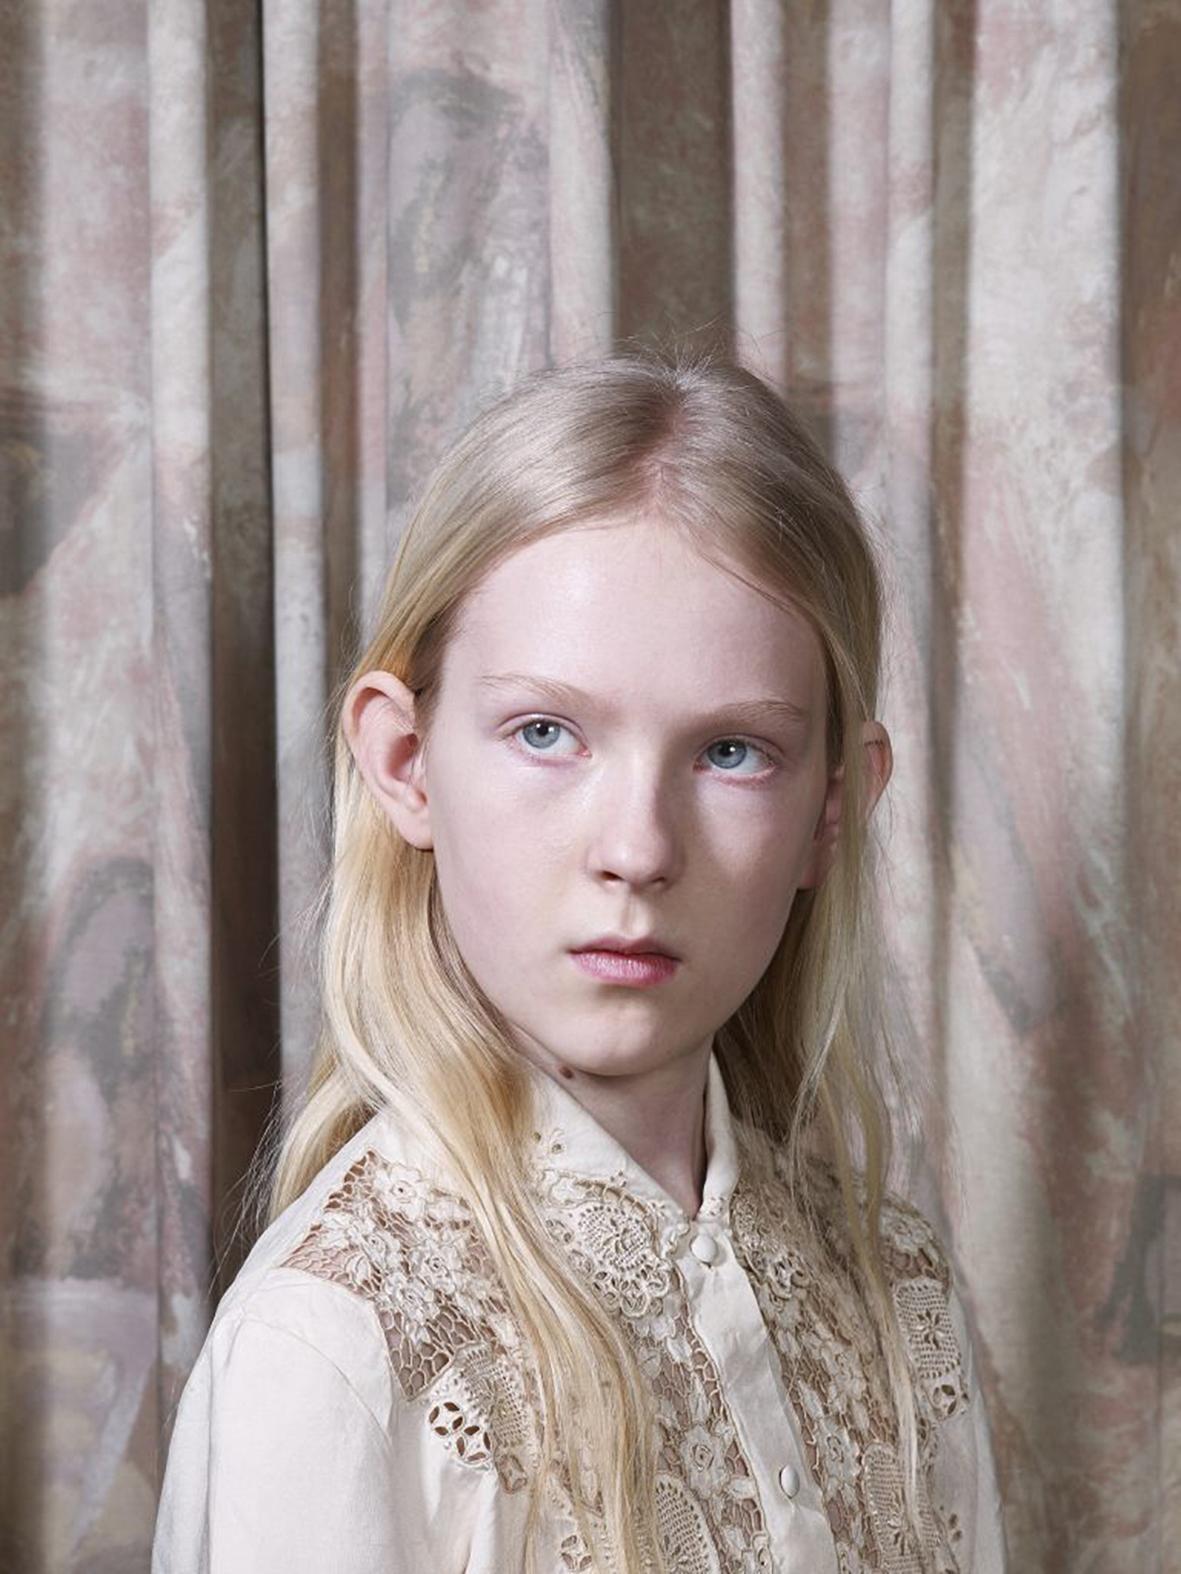 Barten-Styling: Analik / Unit C.M.A. Hair and Make-up: Patricia van Heumen / Angelique Hoorn management Model: Elve Lijbaart / Zaza casting